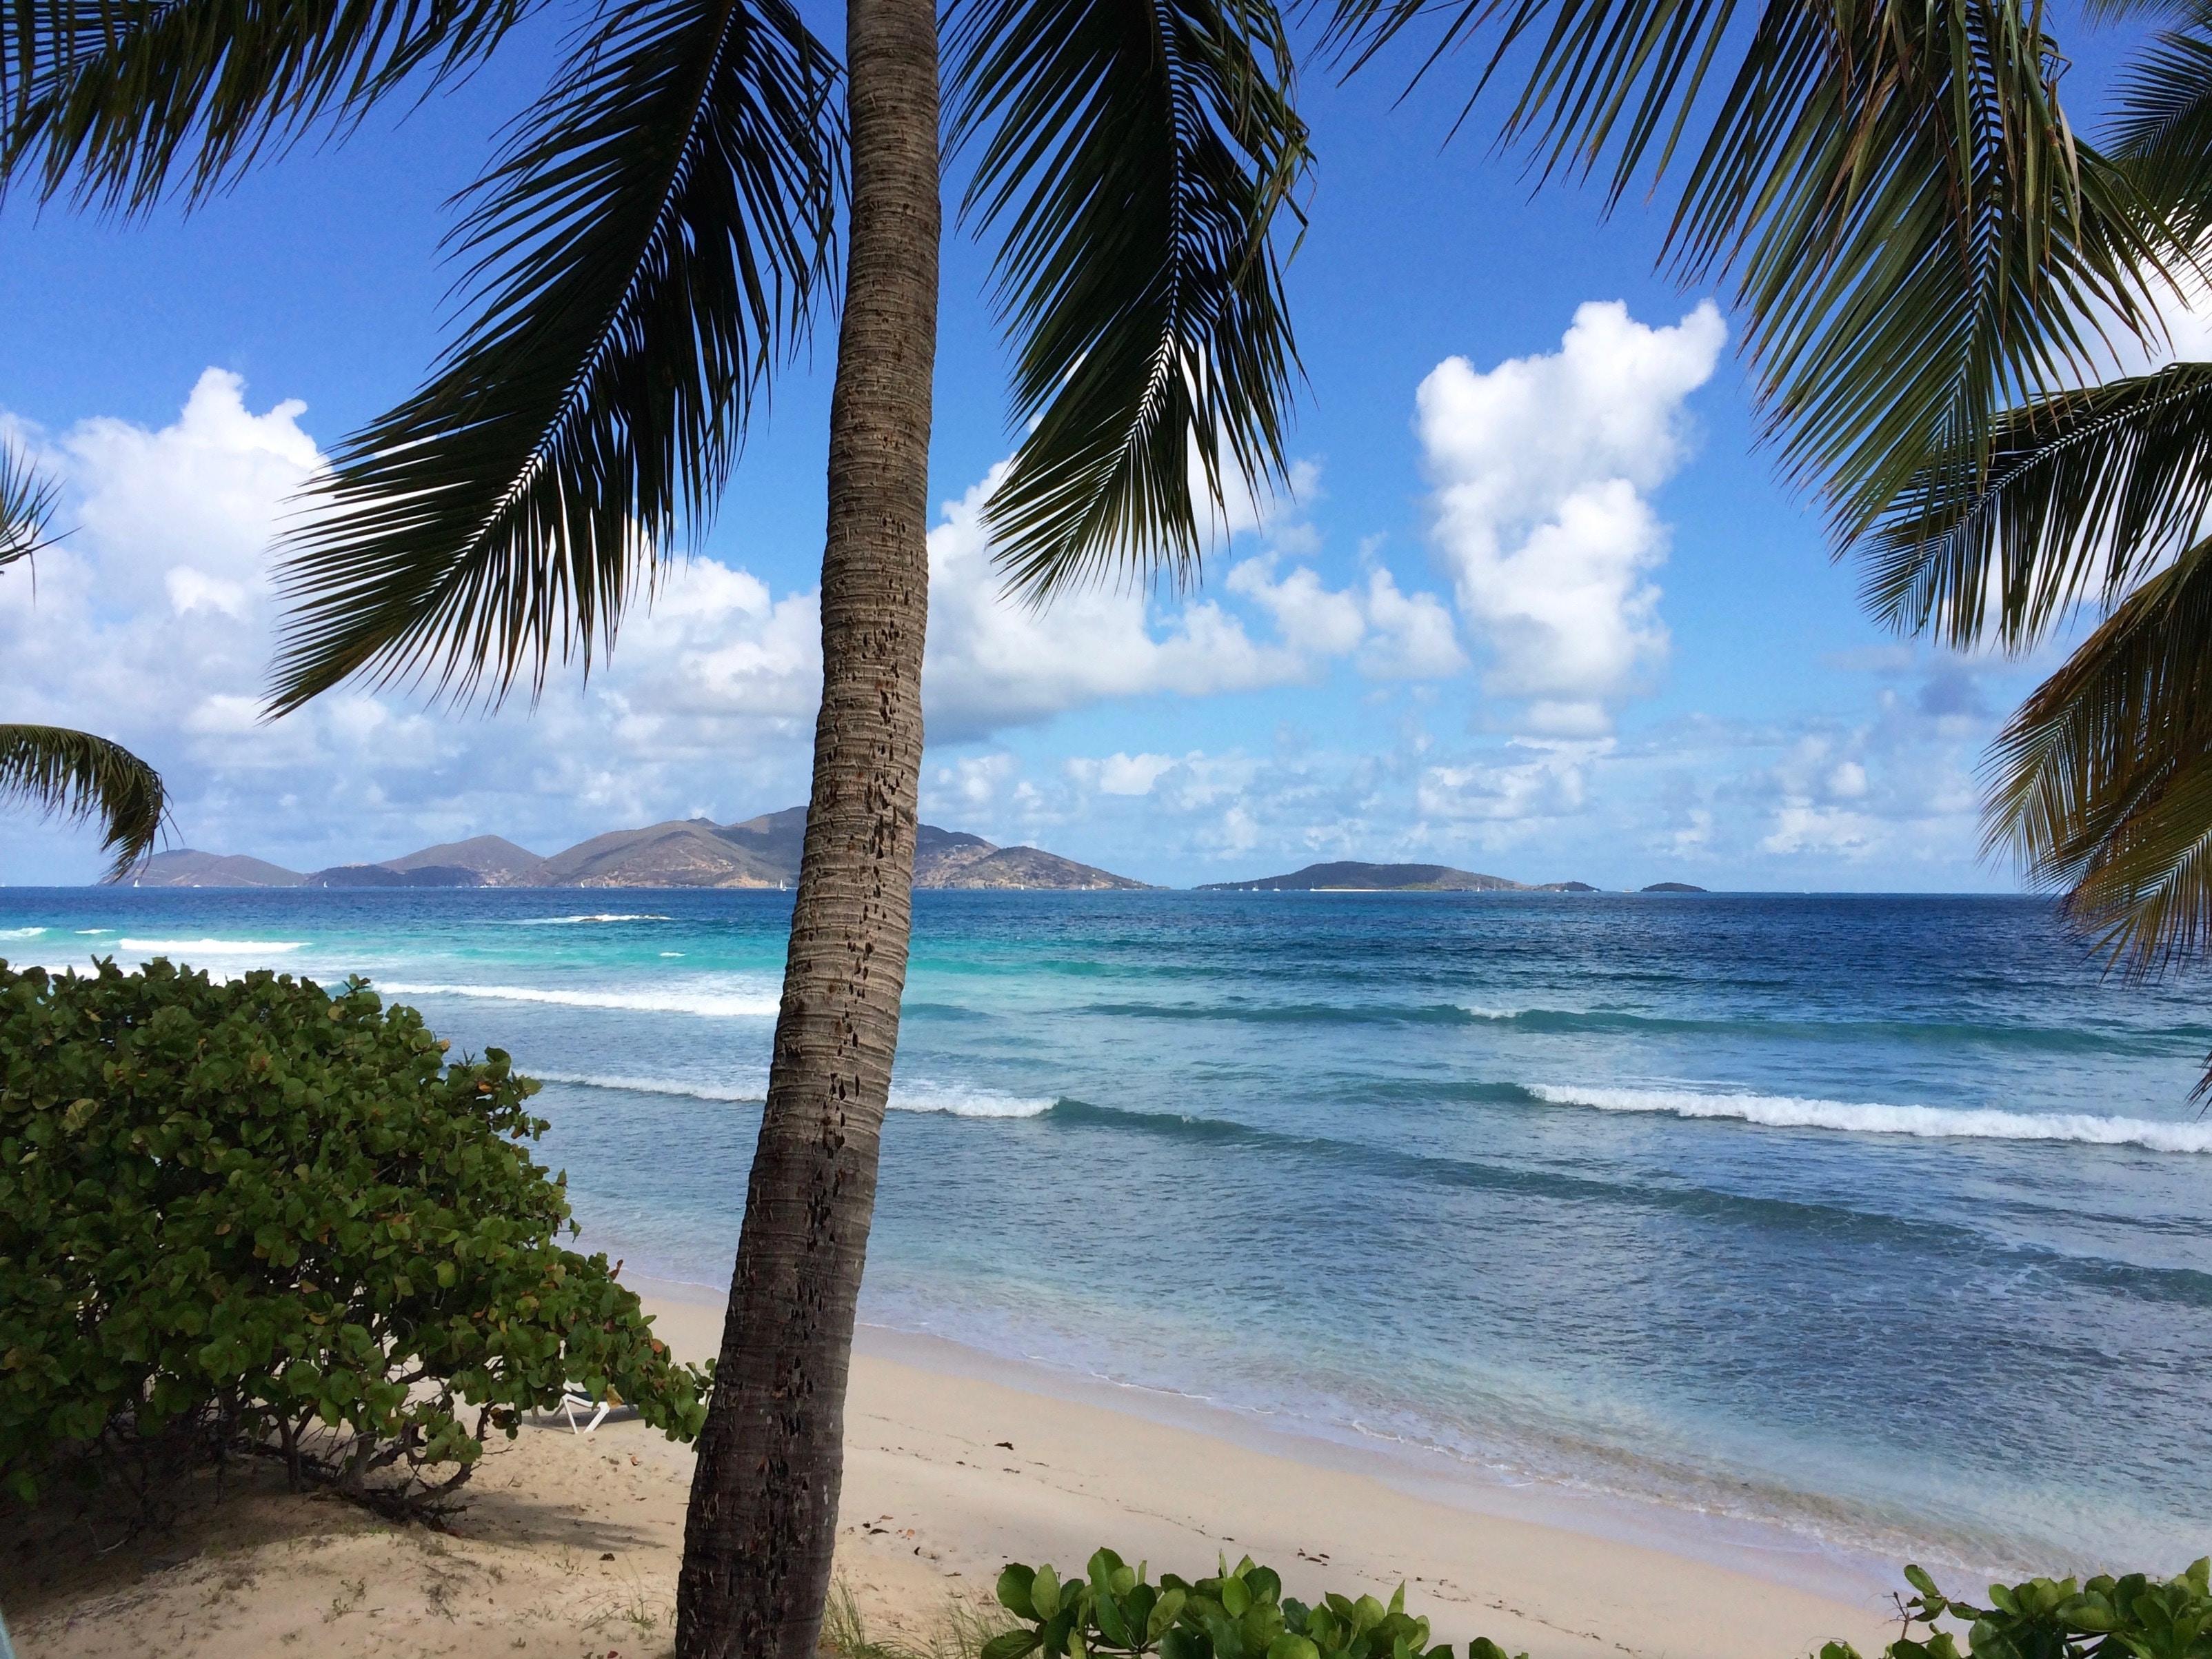 coconut tree on seashore